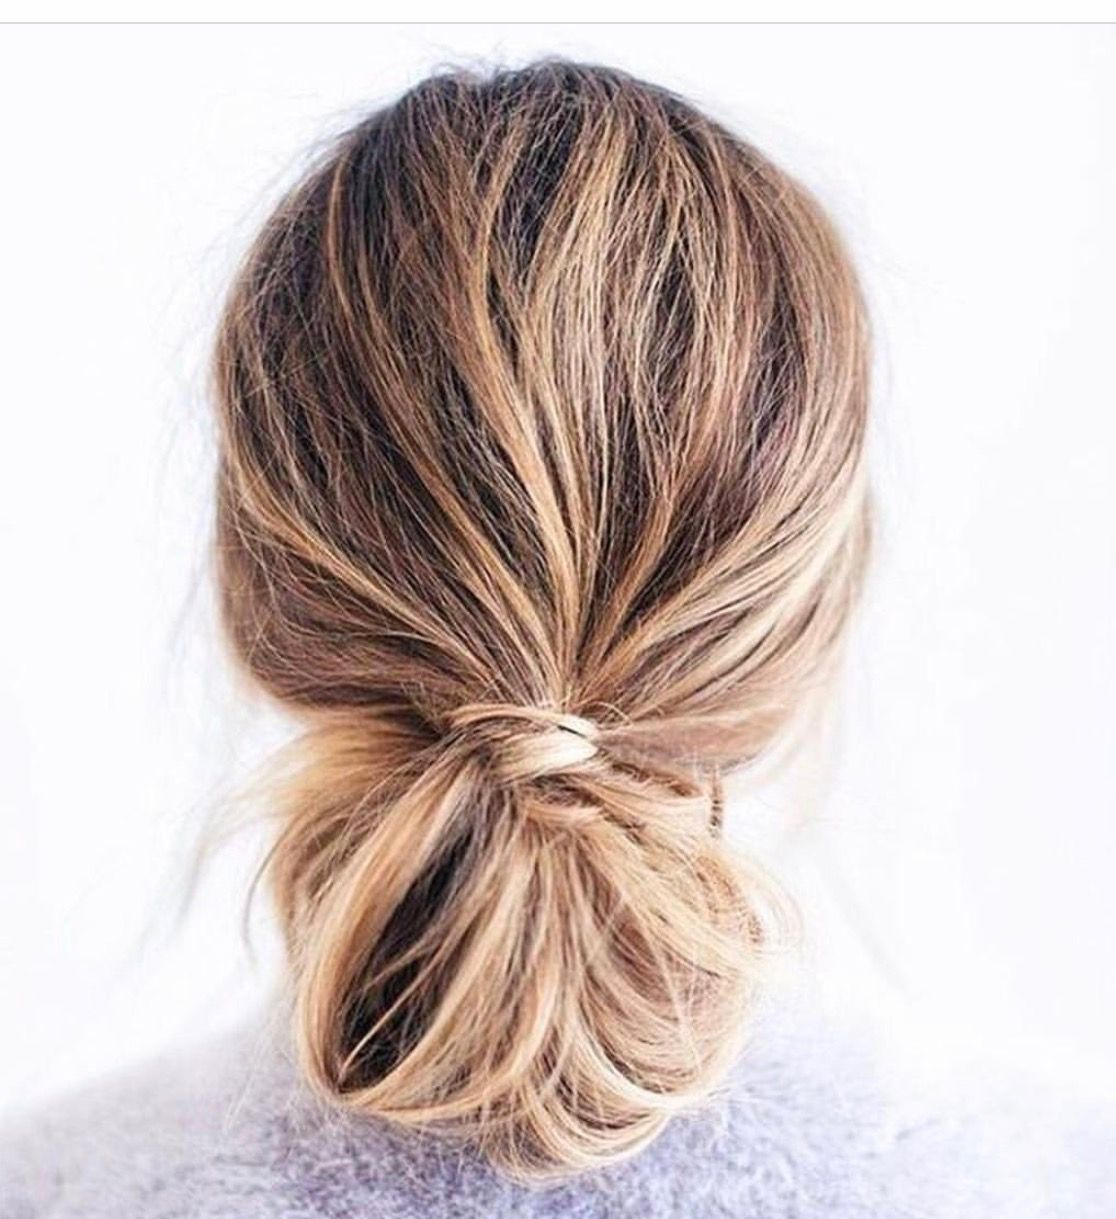 Pin by marina stoean on hairstyles pinterest hair style hair